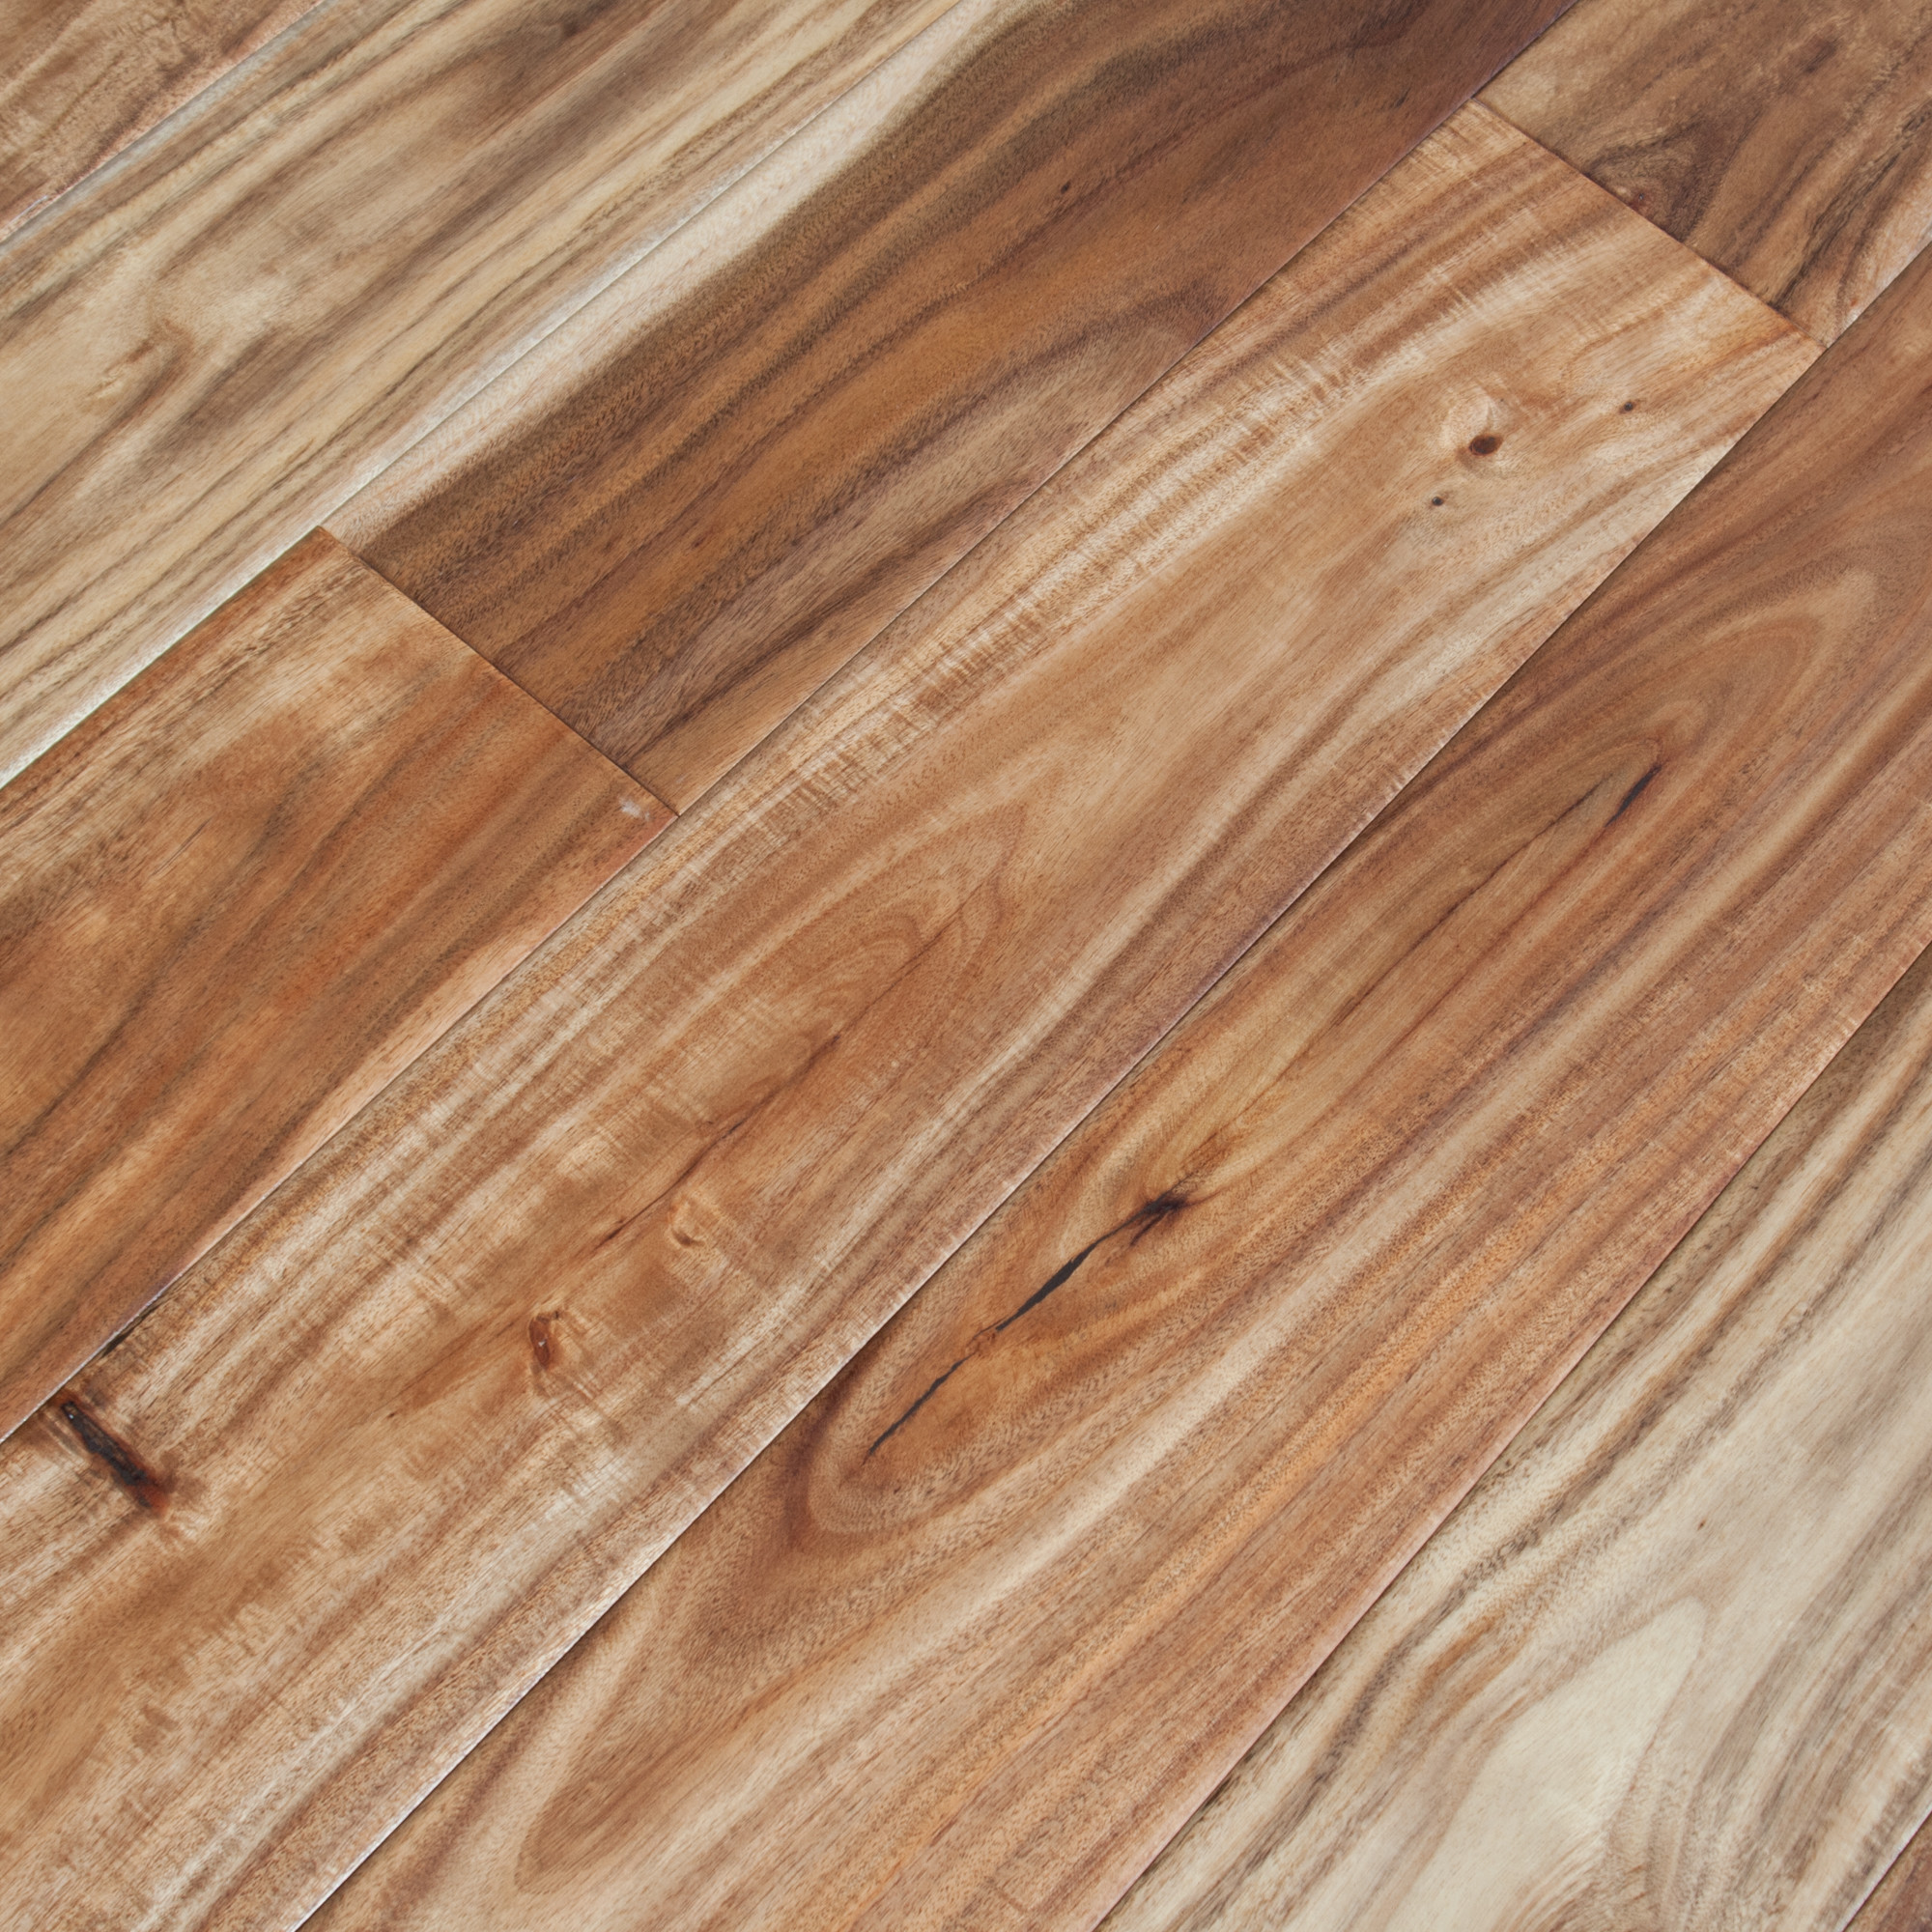 25 Cute 2 Mm Engineered Hardwood Flooring 2021 free download 2 mm engineered hardwood flooring of 9 mile creek acacia hand scraped acacia confusa wood floors pertaining to acacia handscraped natural hardwood flooring